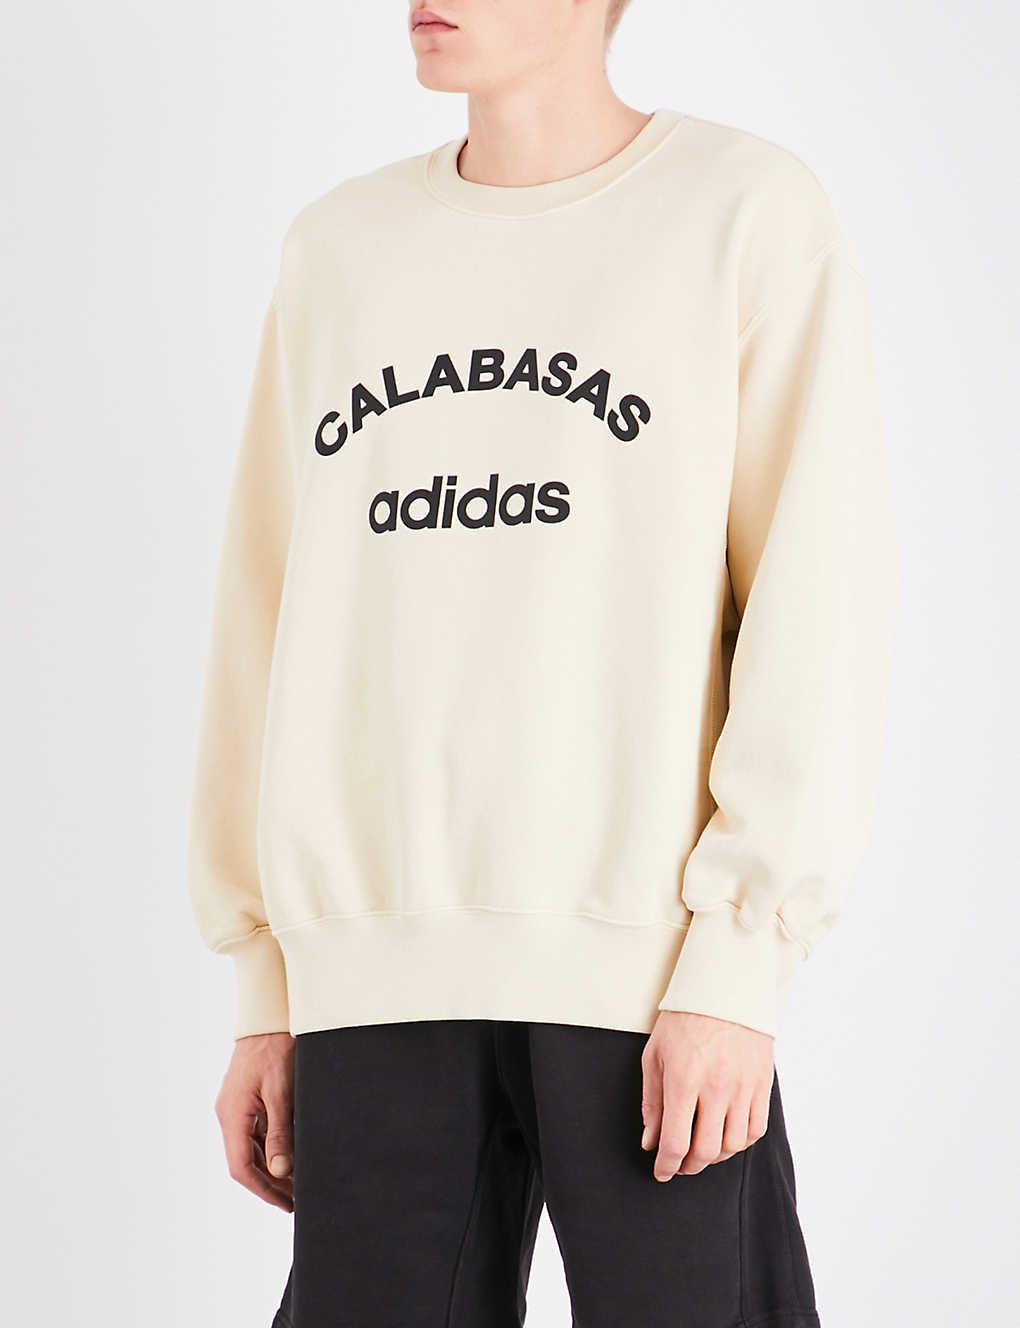 Adidas. Yeezy Season 5 Calabasas